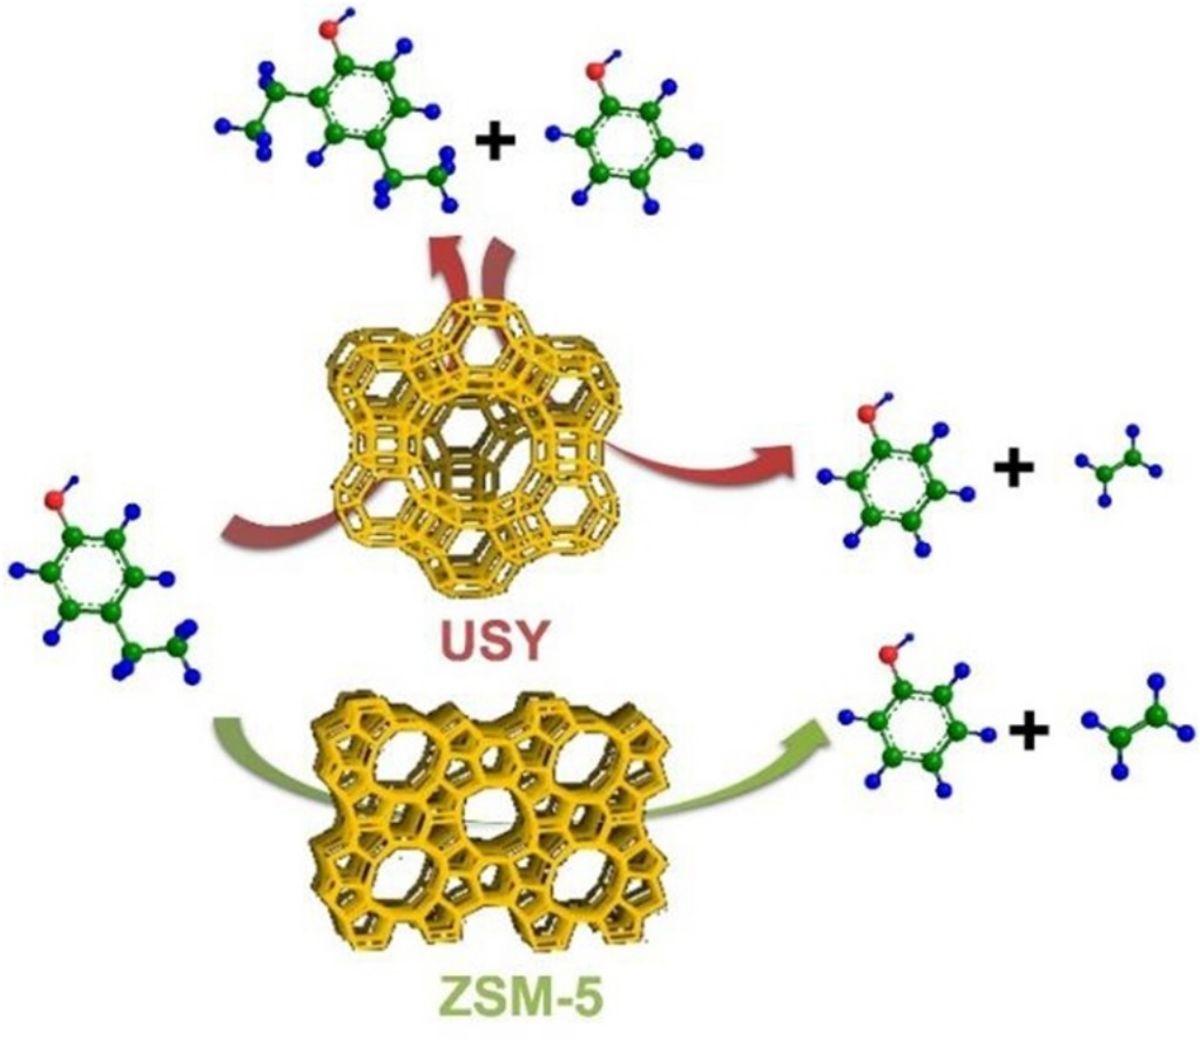 Shape selectivity vapor-phase conversion of lignin-derived 4-ethylphenol to phenol and ethylene over acidic aluminosilicates: Impact of acid properties and pore constraint